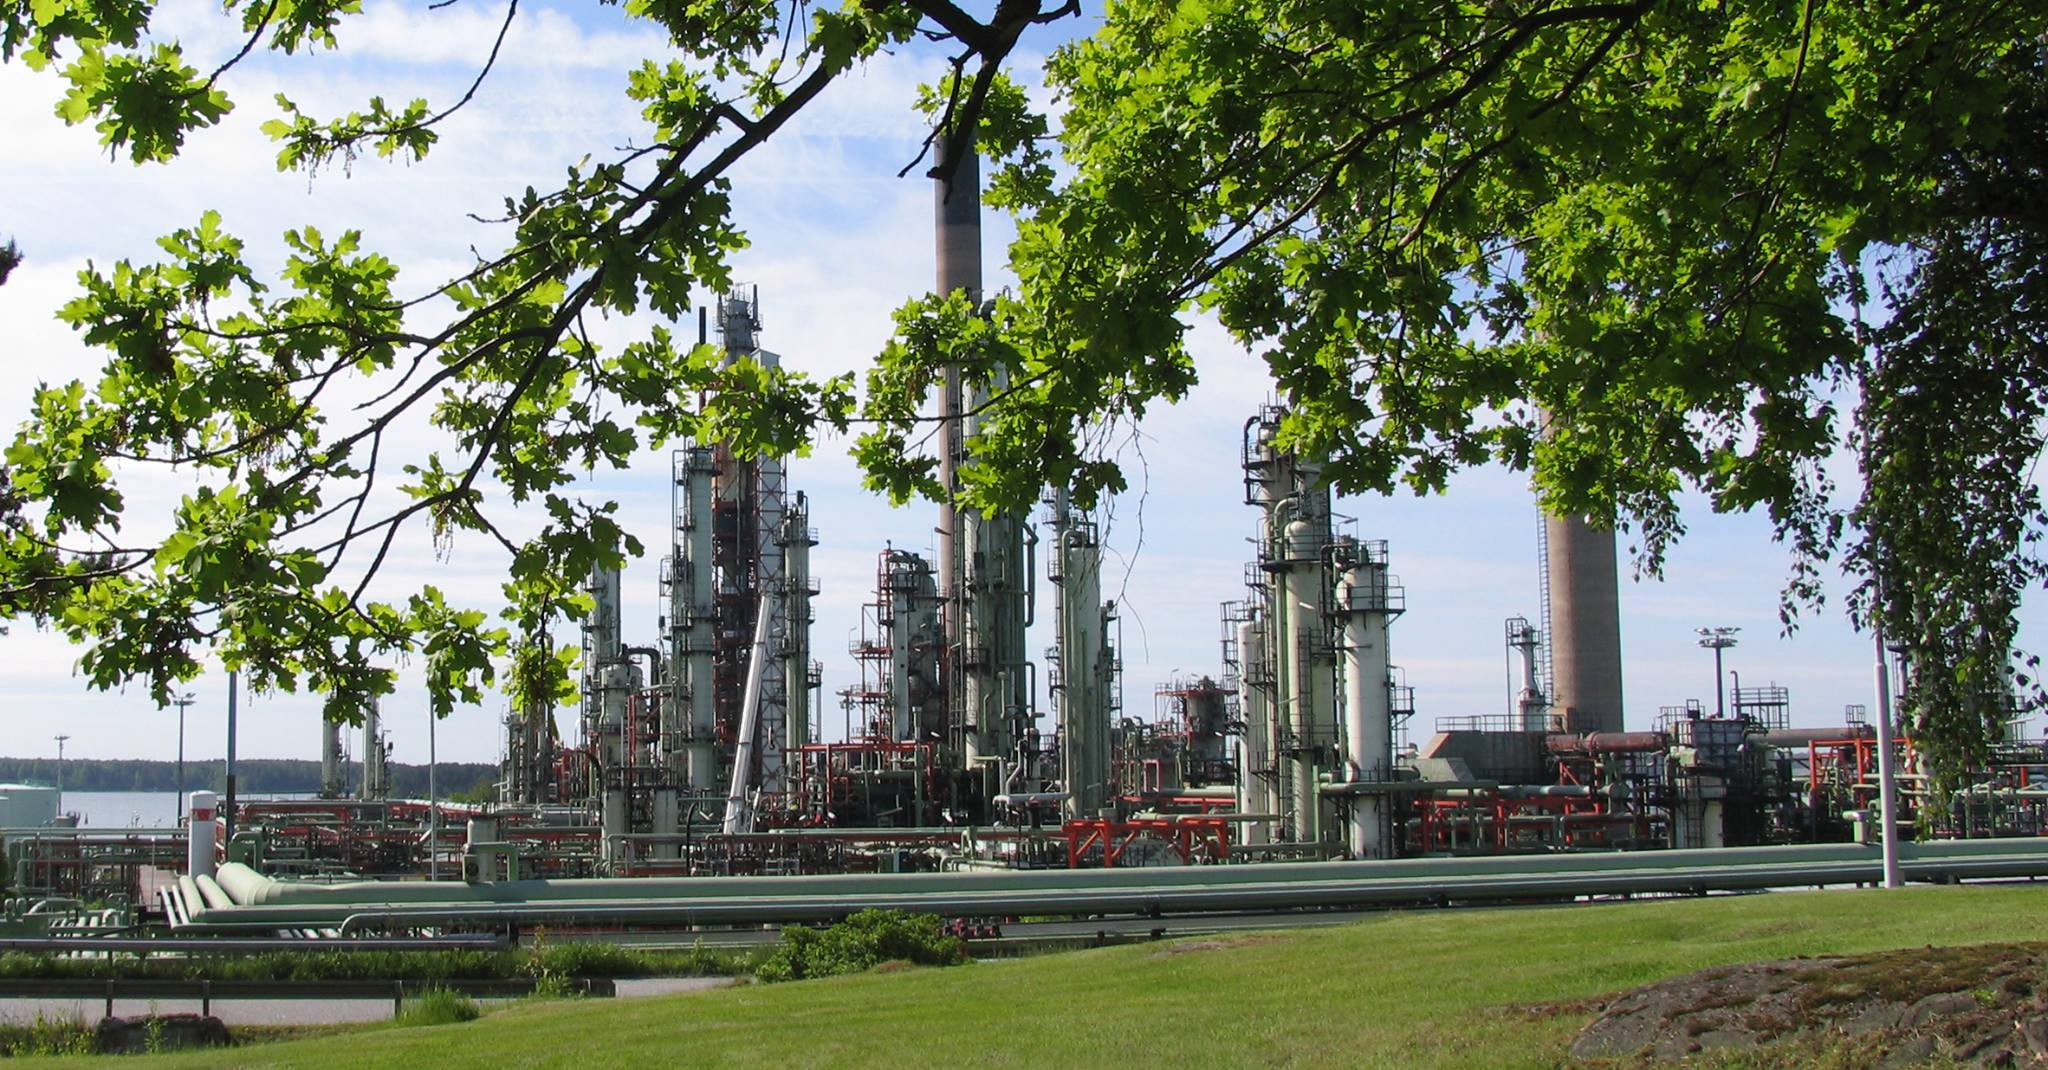 Neste - Naantali refinery